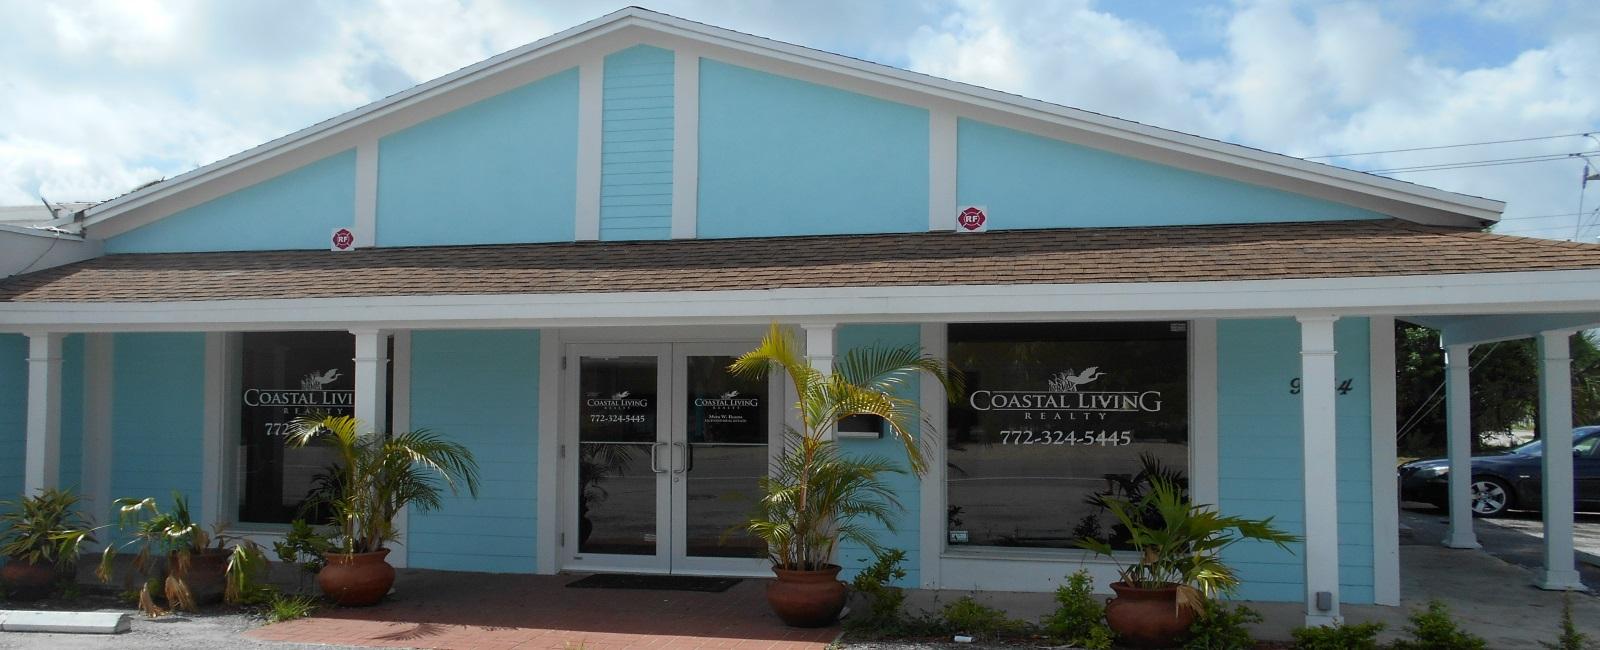 Coastal Living RealtyHome | Coastal Living Realty